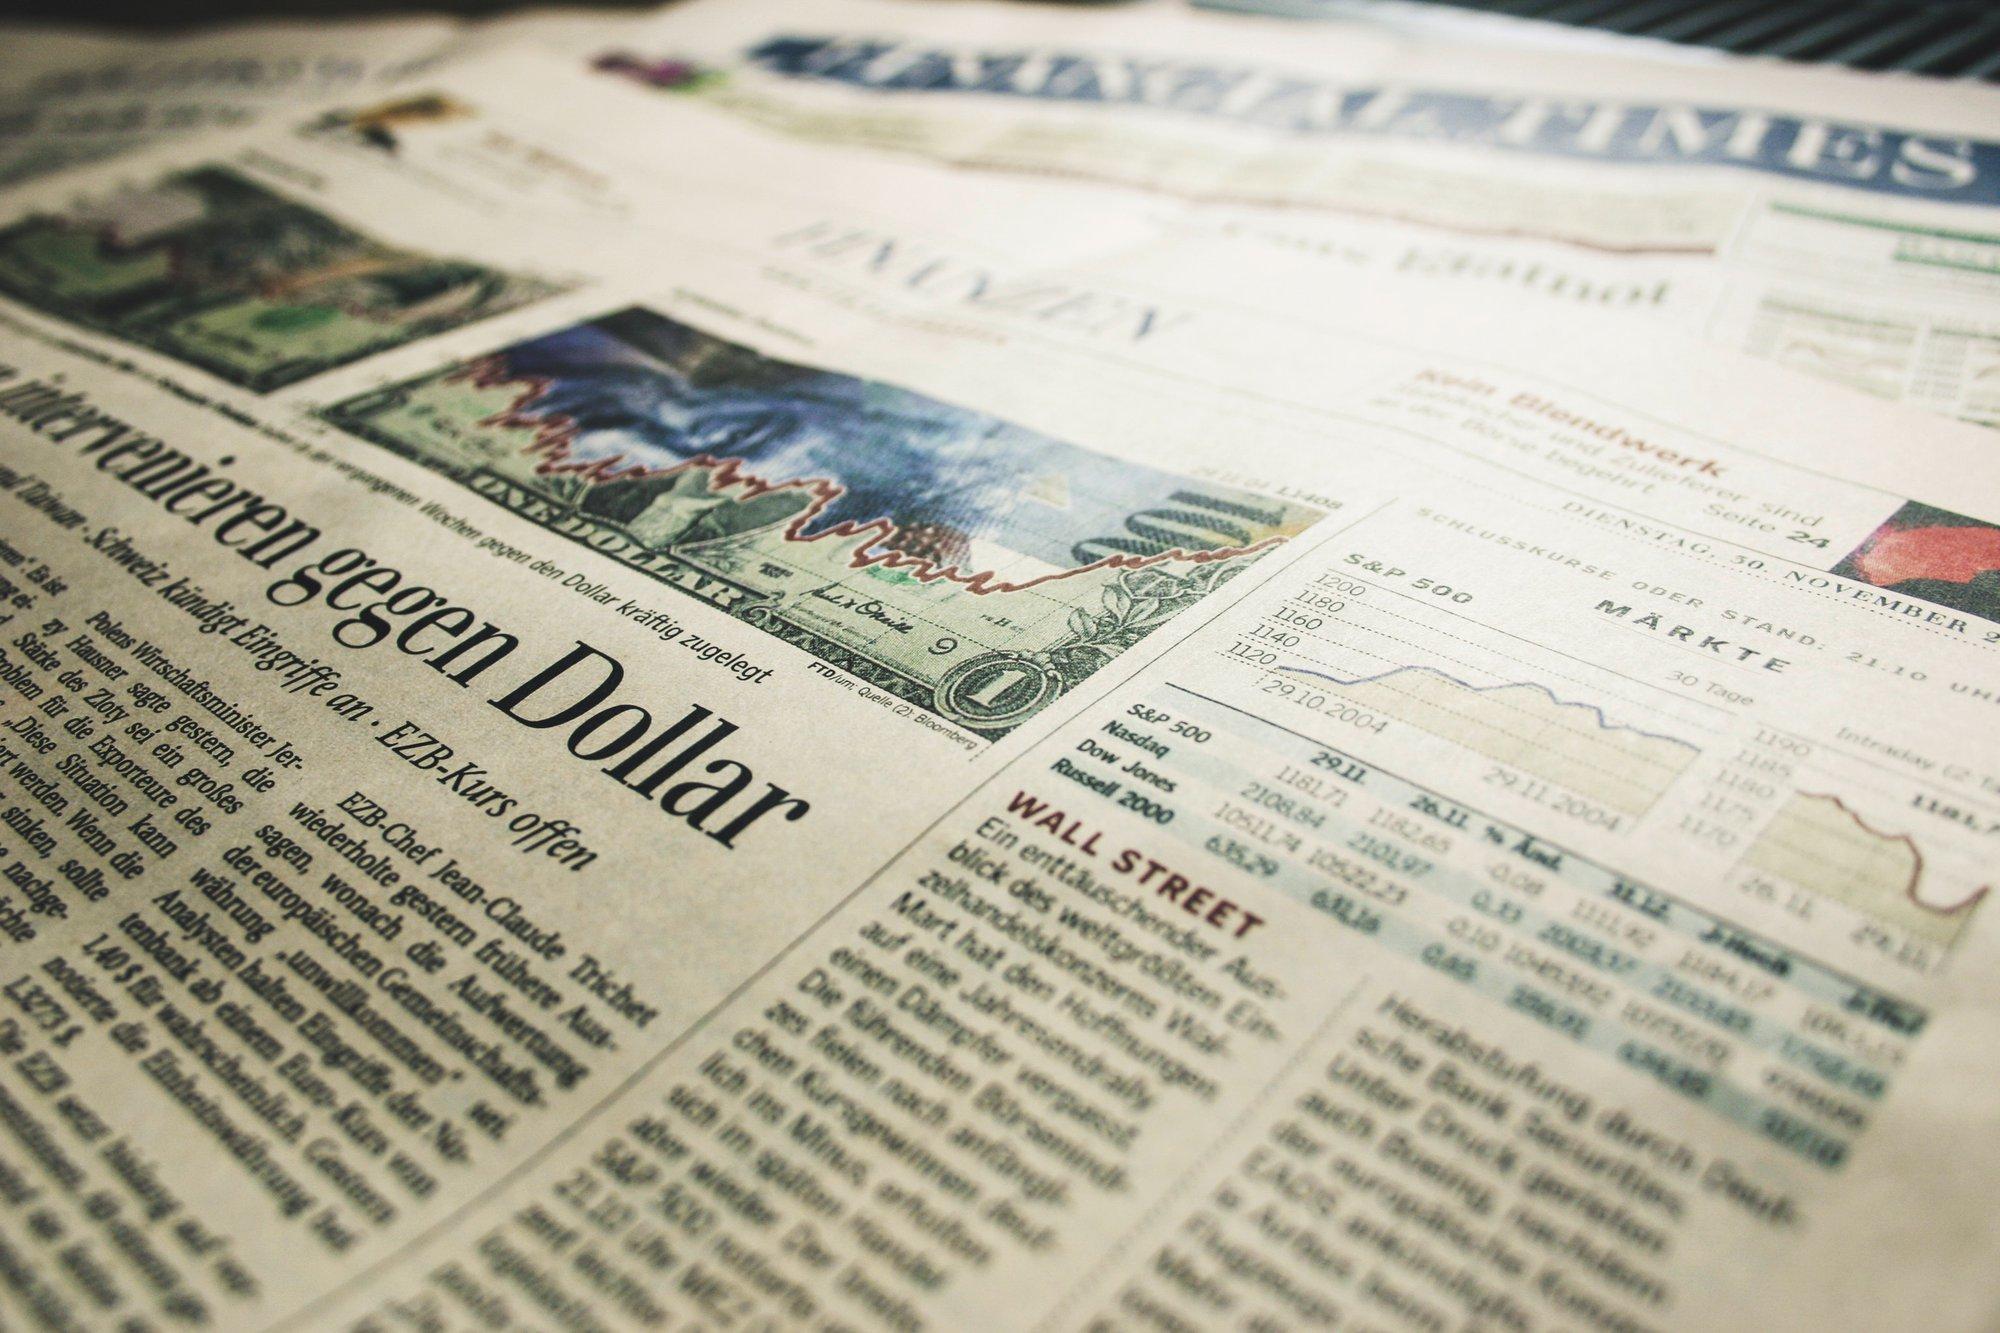 Weekly Press Review: Dubai Business News: January 13-19, 2019